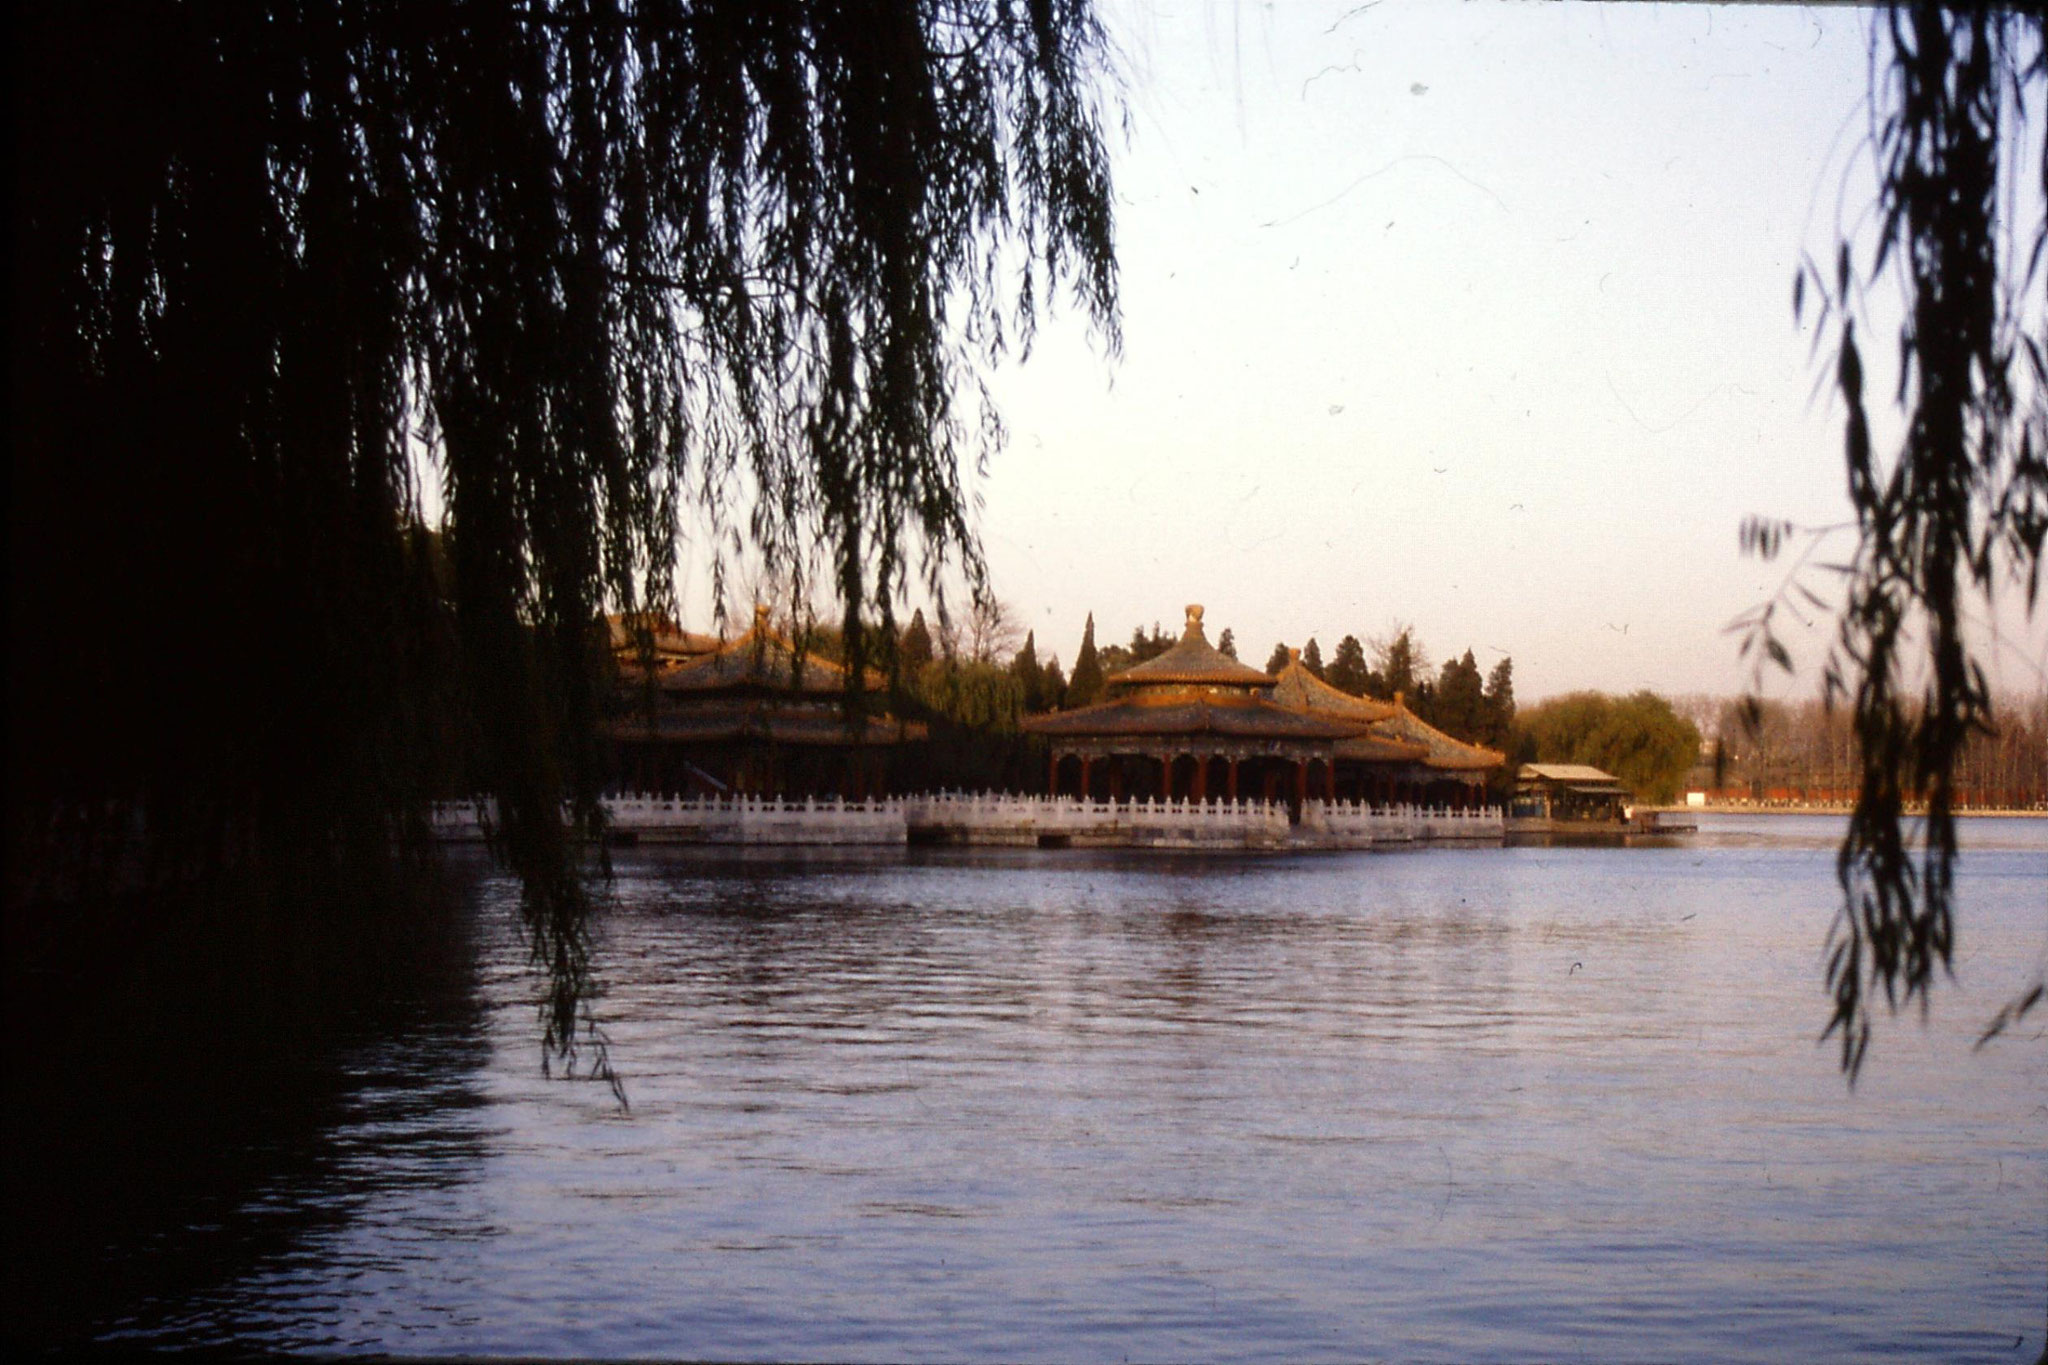 26/11/1988: 9:Beihai Park